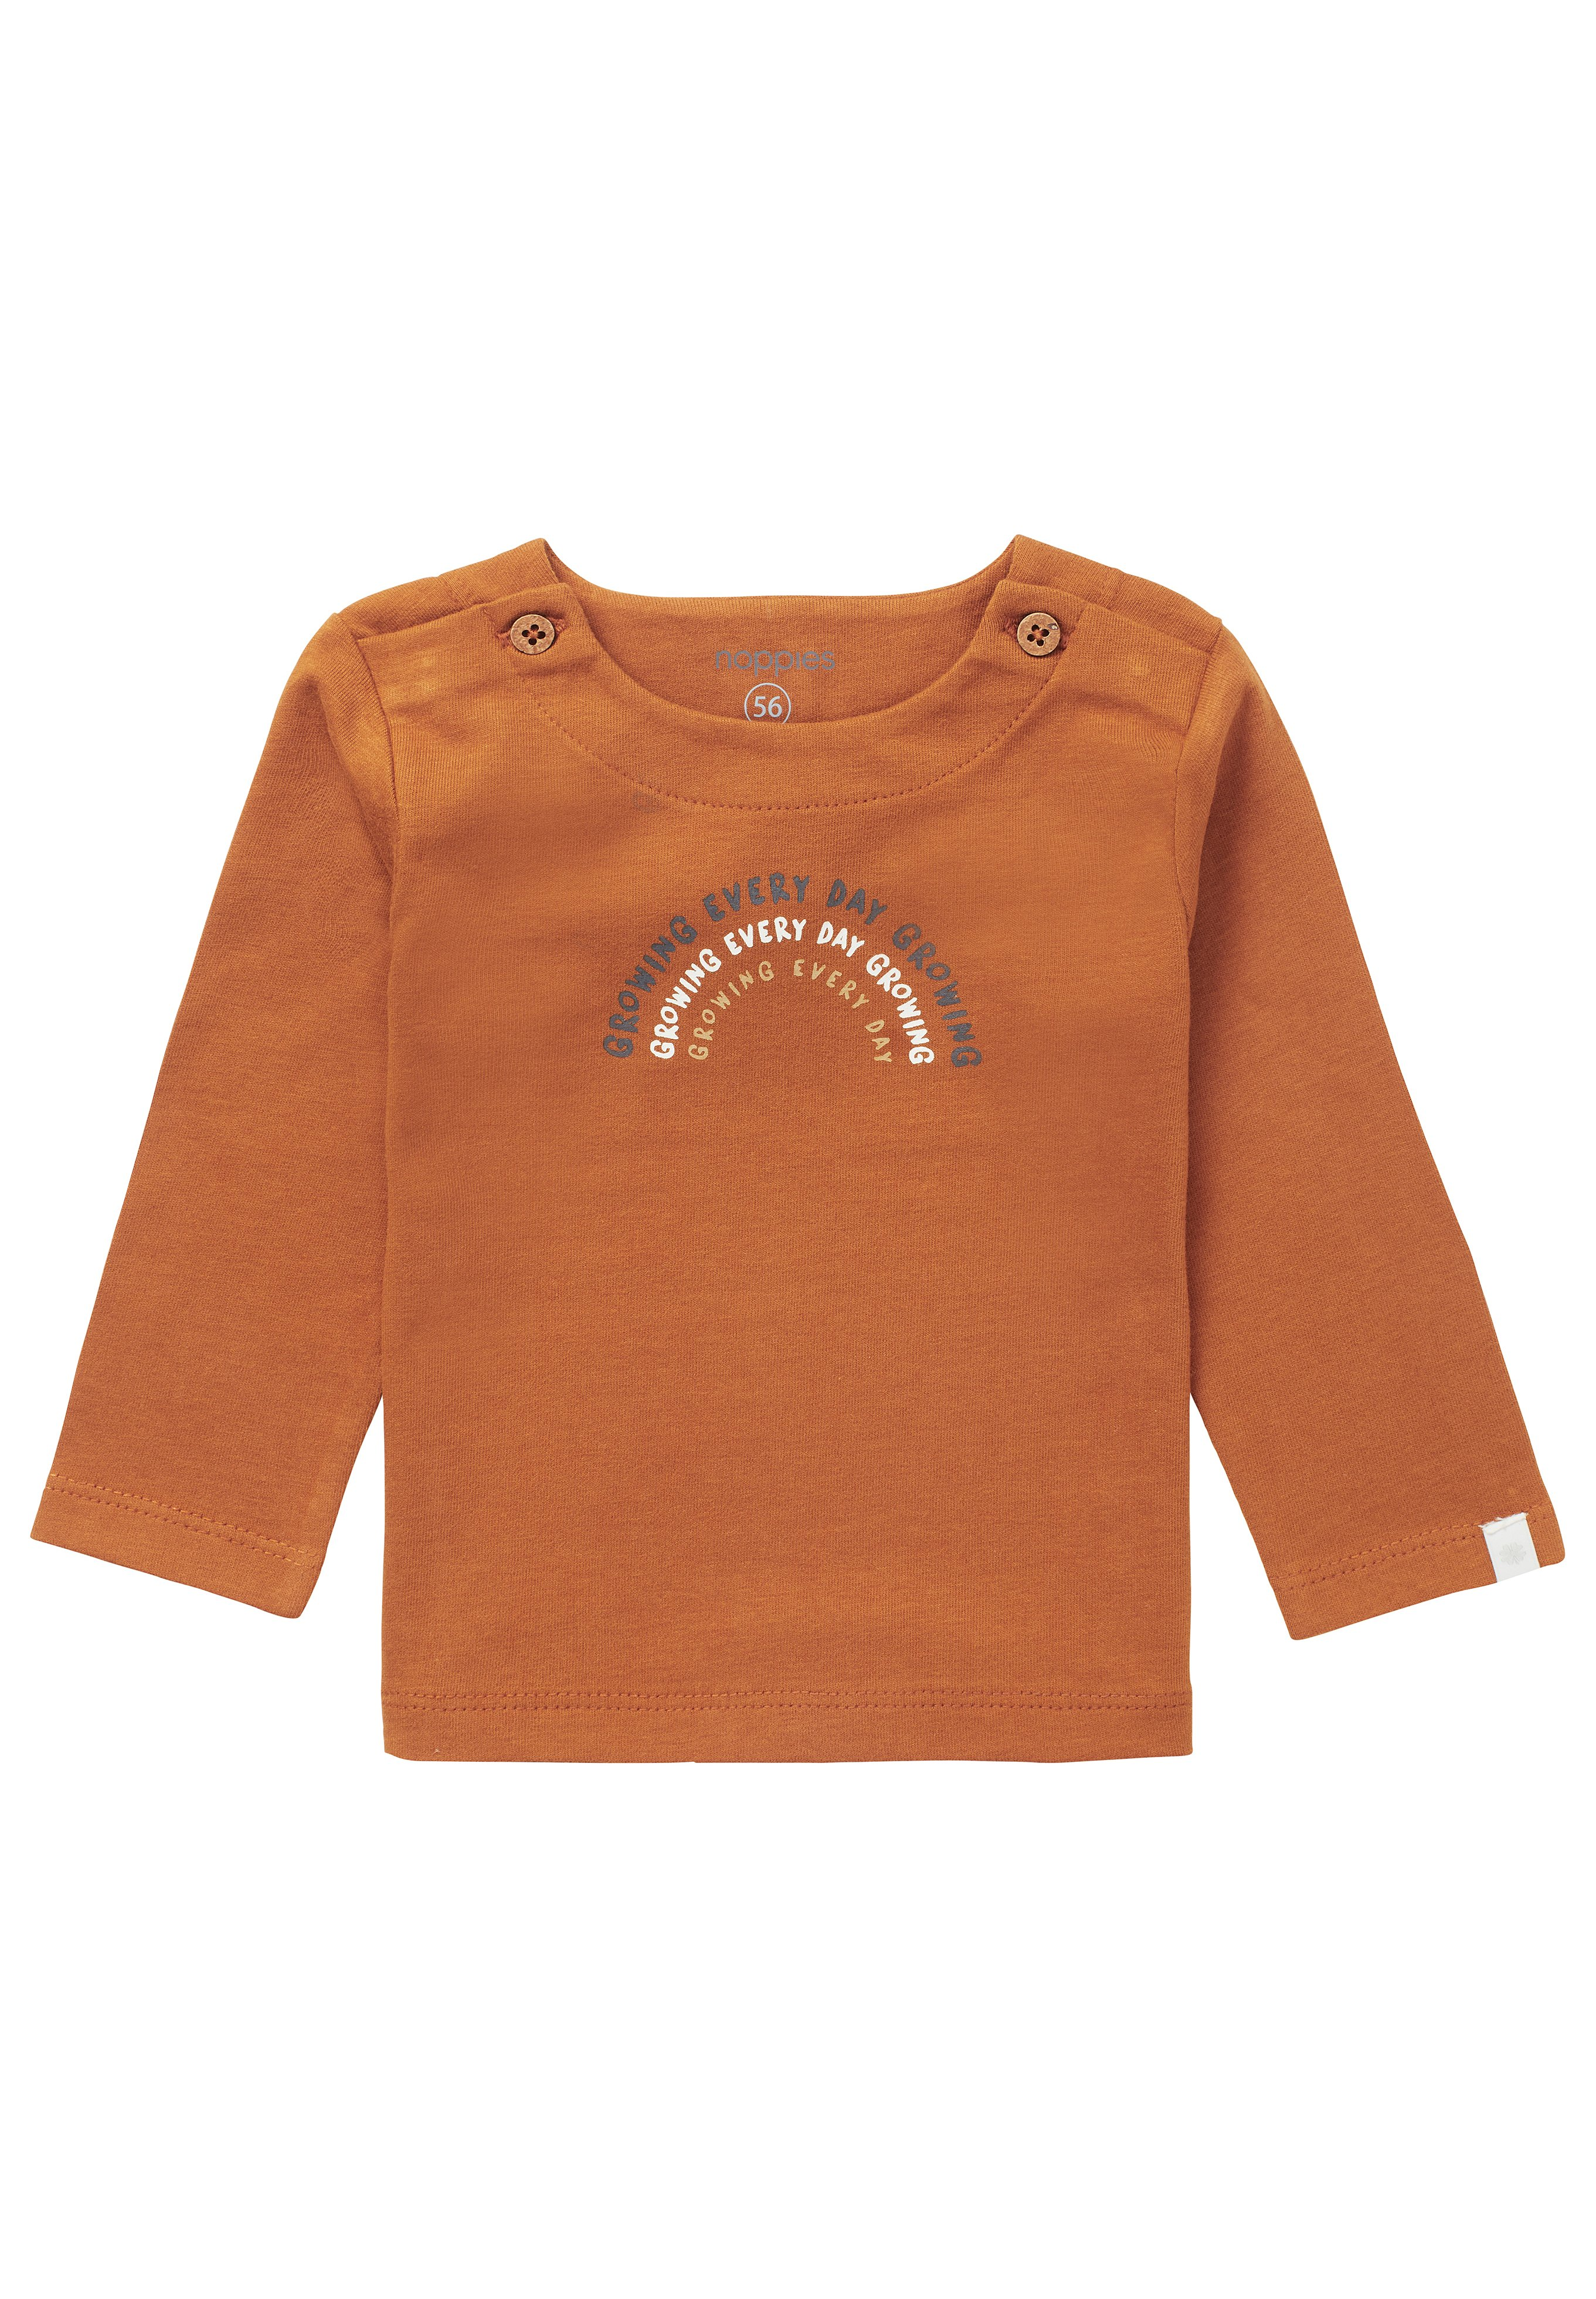 Kinder SHIELDS - Long sleeved top - Langarmshirt